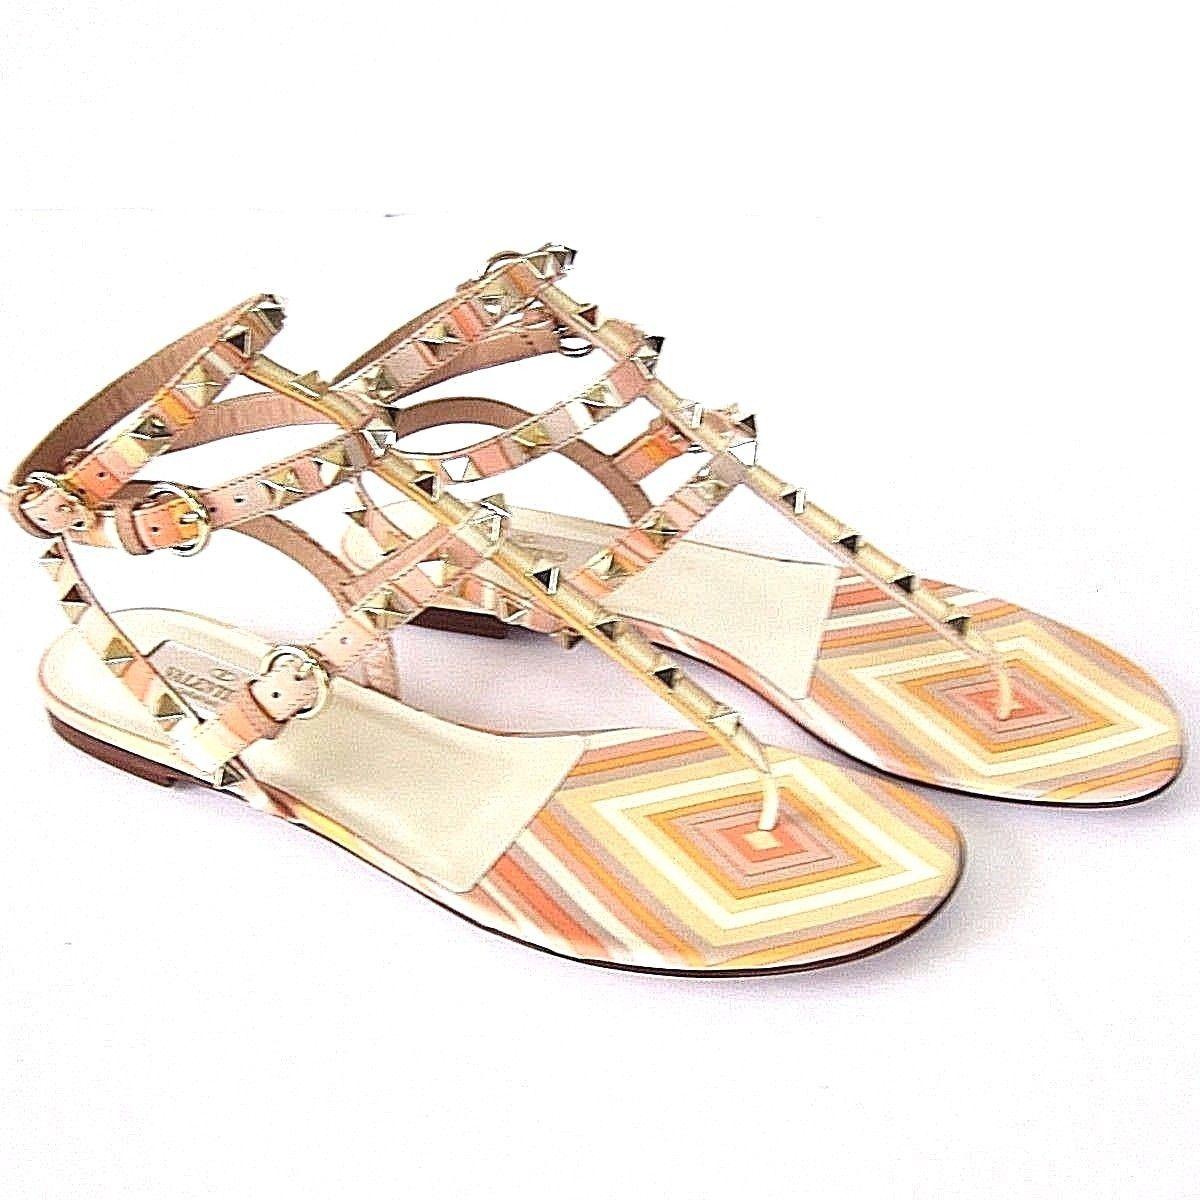 2b1f4dec1a0 Y-2237197 New Valentino Garavani Gold and 50 similar items